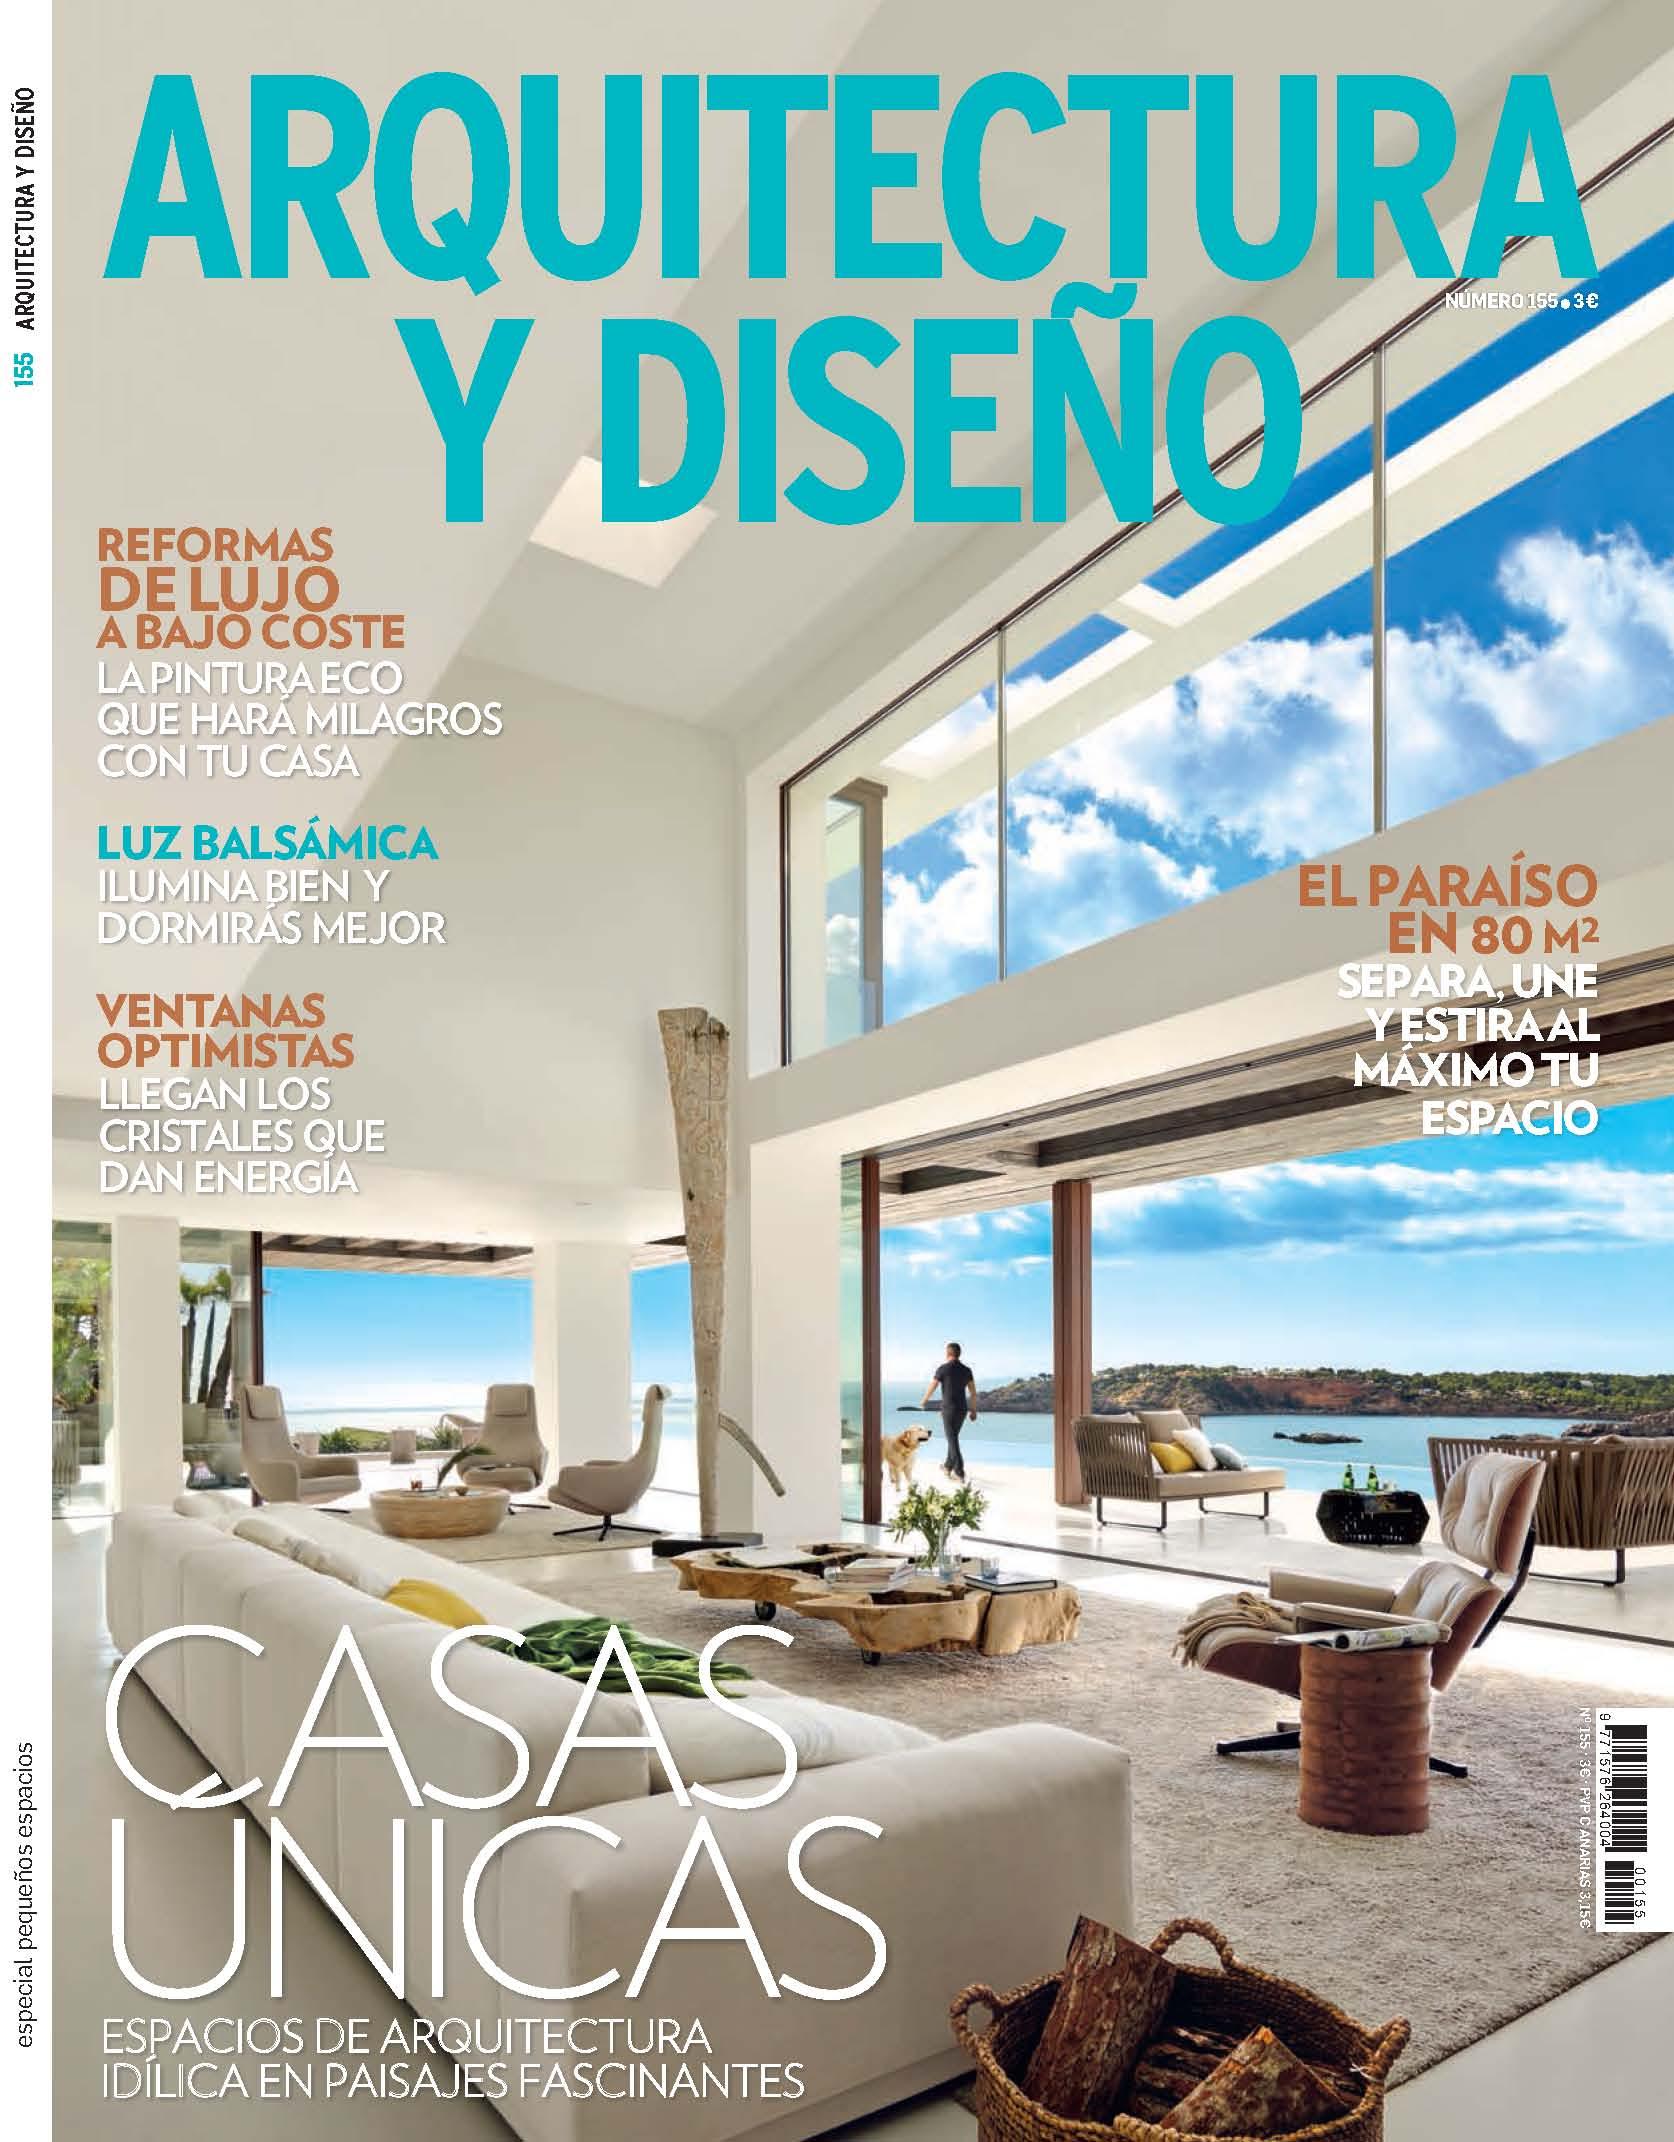 , Arquitectura y Diseño enero 2014, Gunni & Trentino